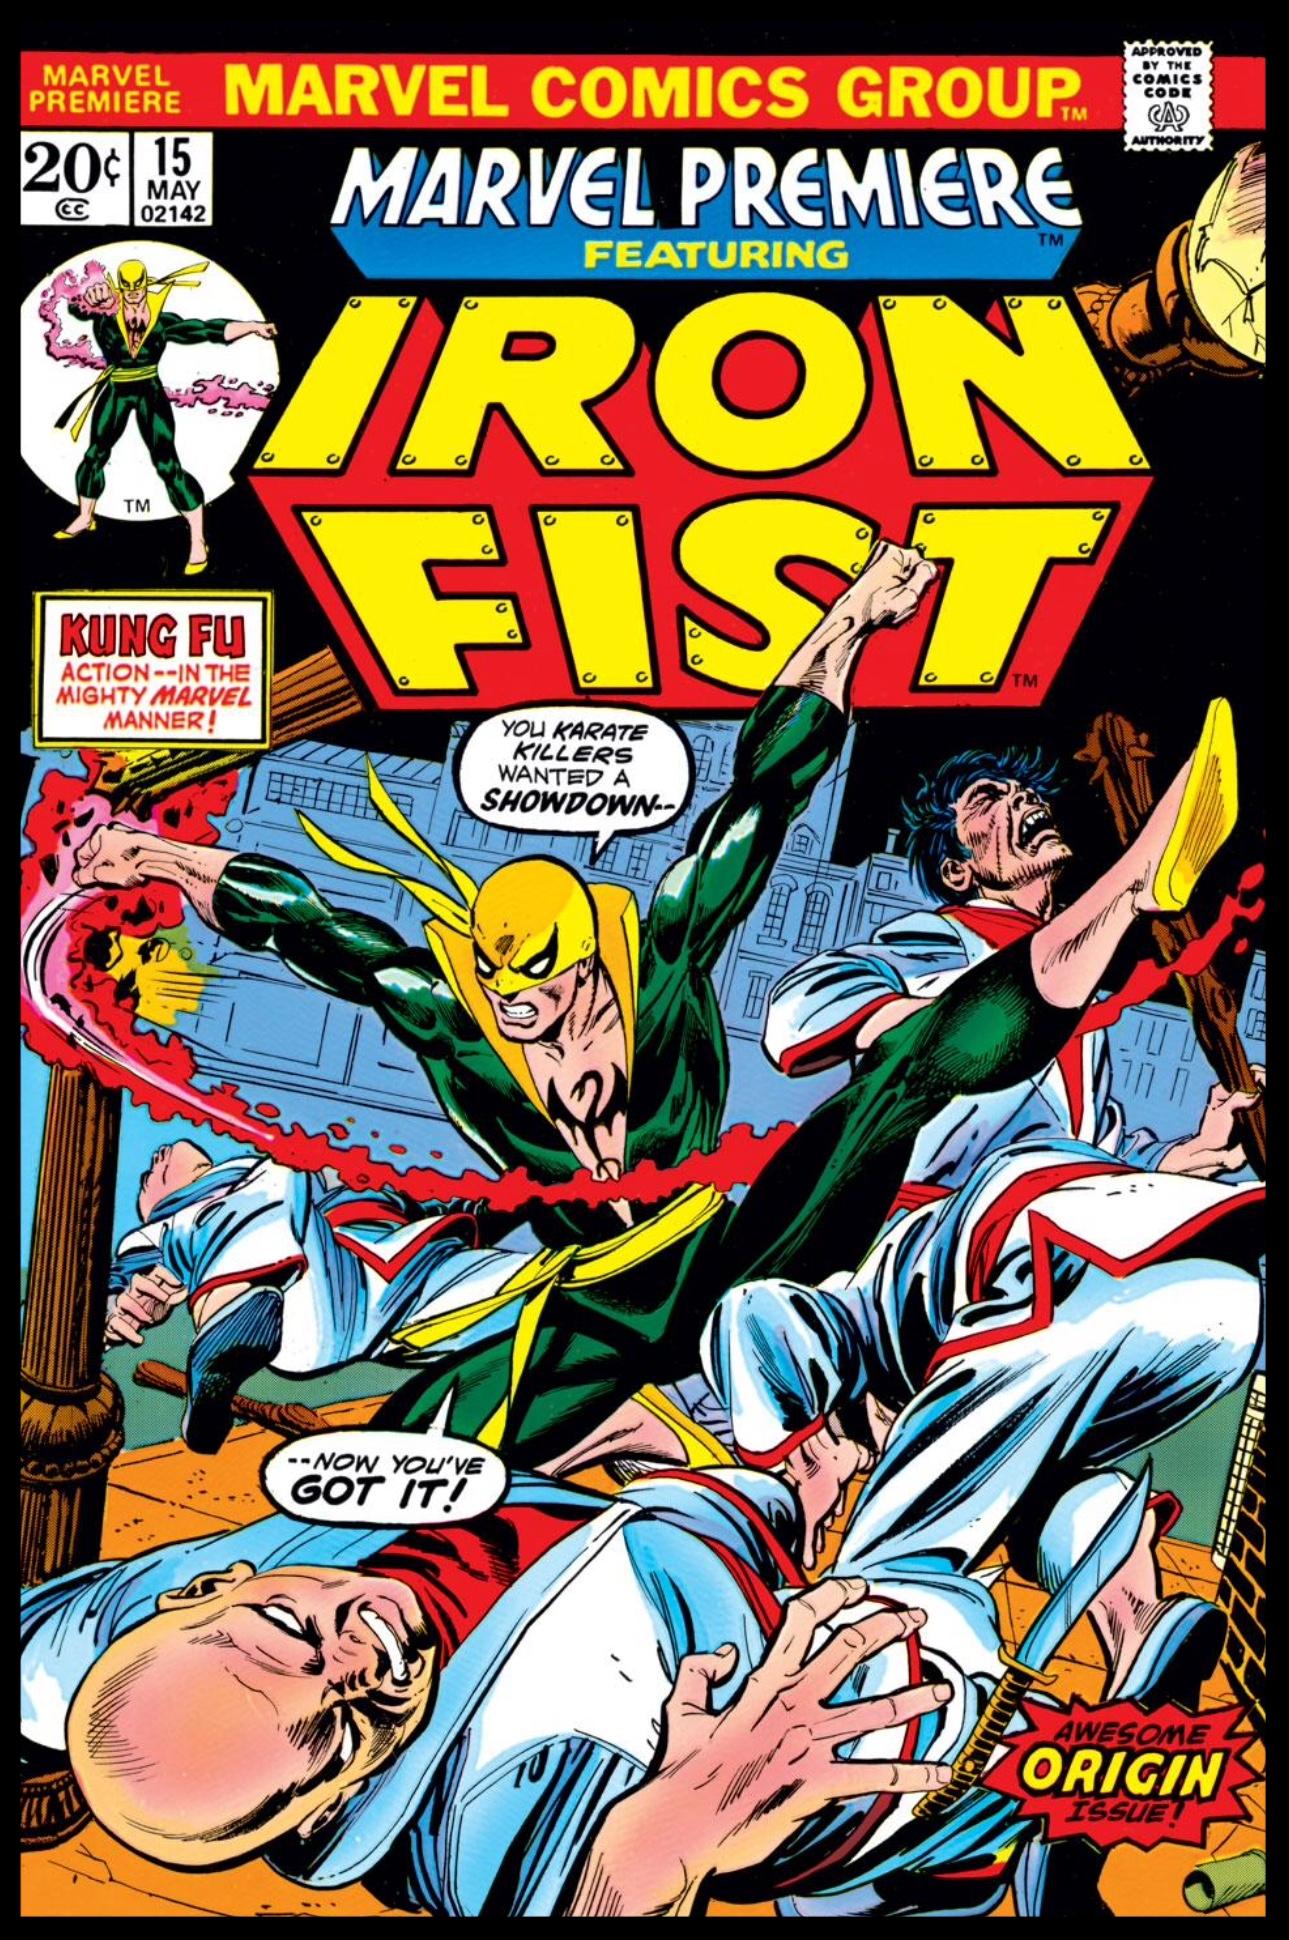 Marvel Premiere #15 Cover